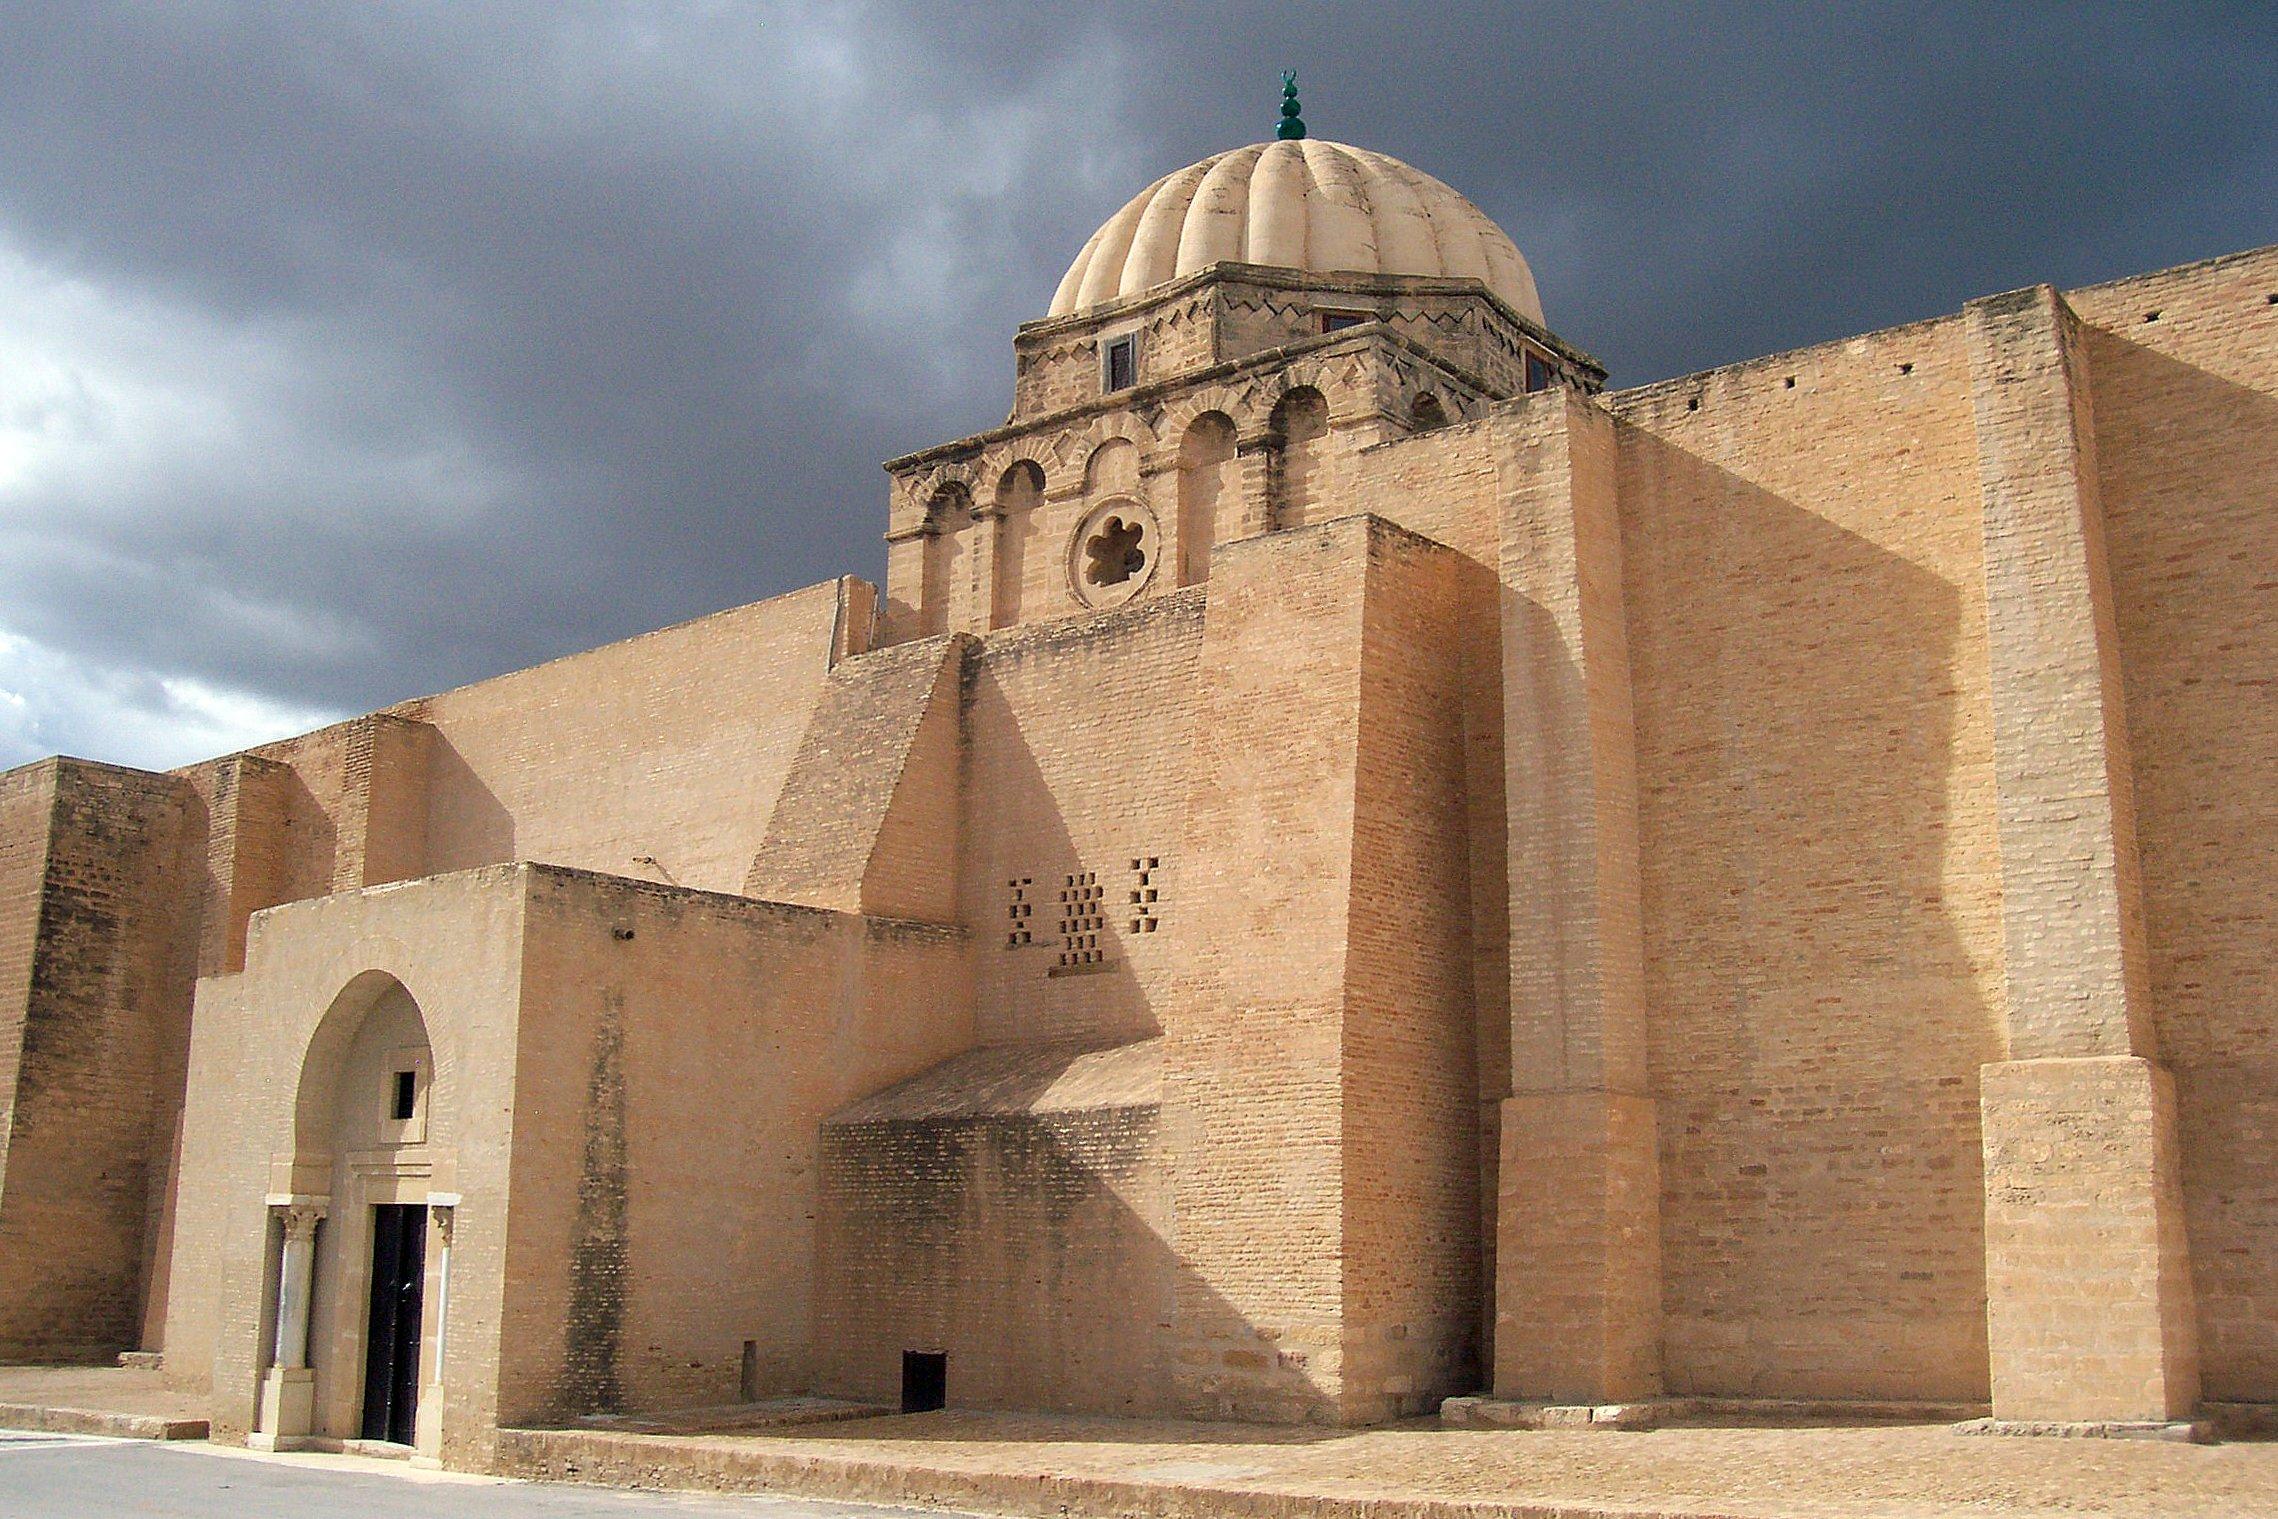 Kairouan Mosque Wiki Mosque of Kairouan.jpg